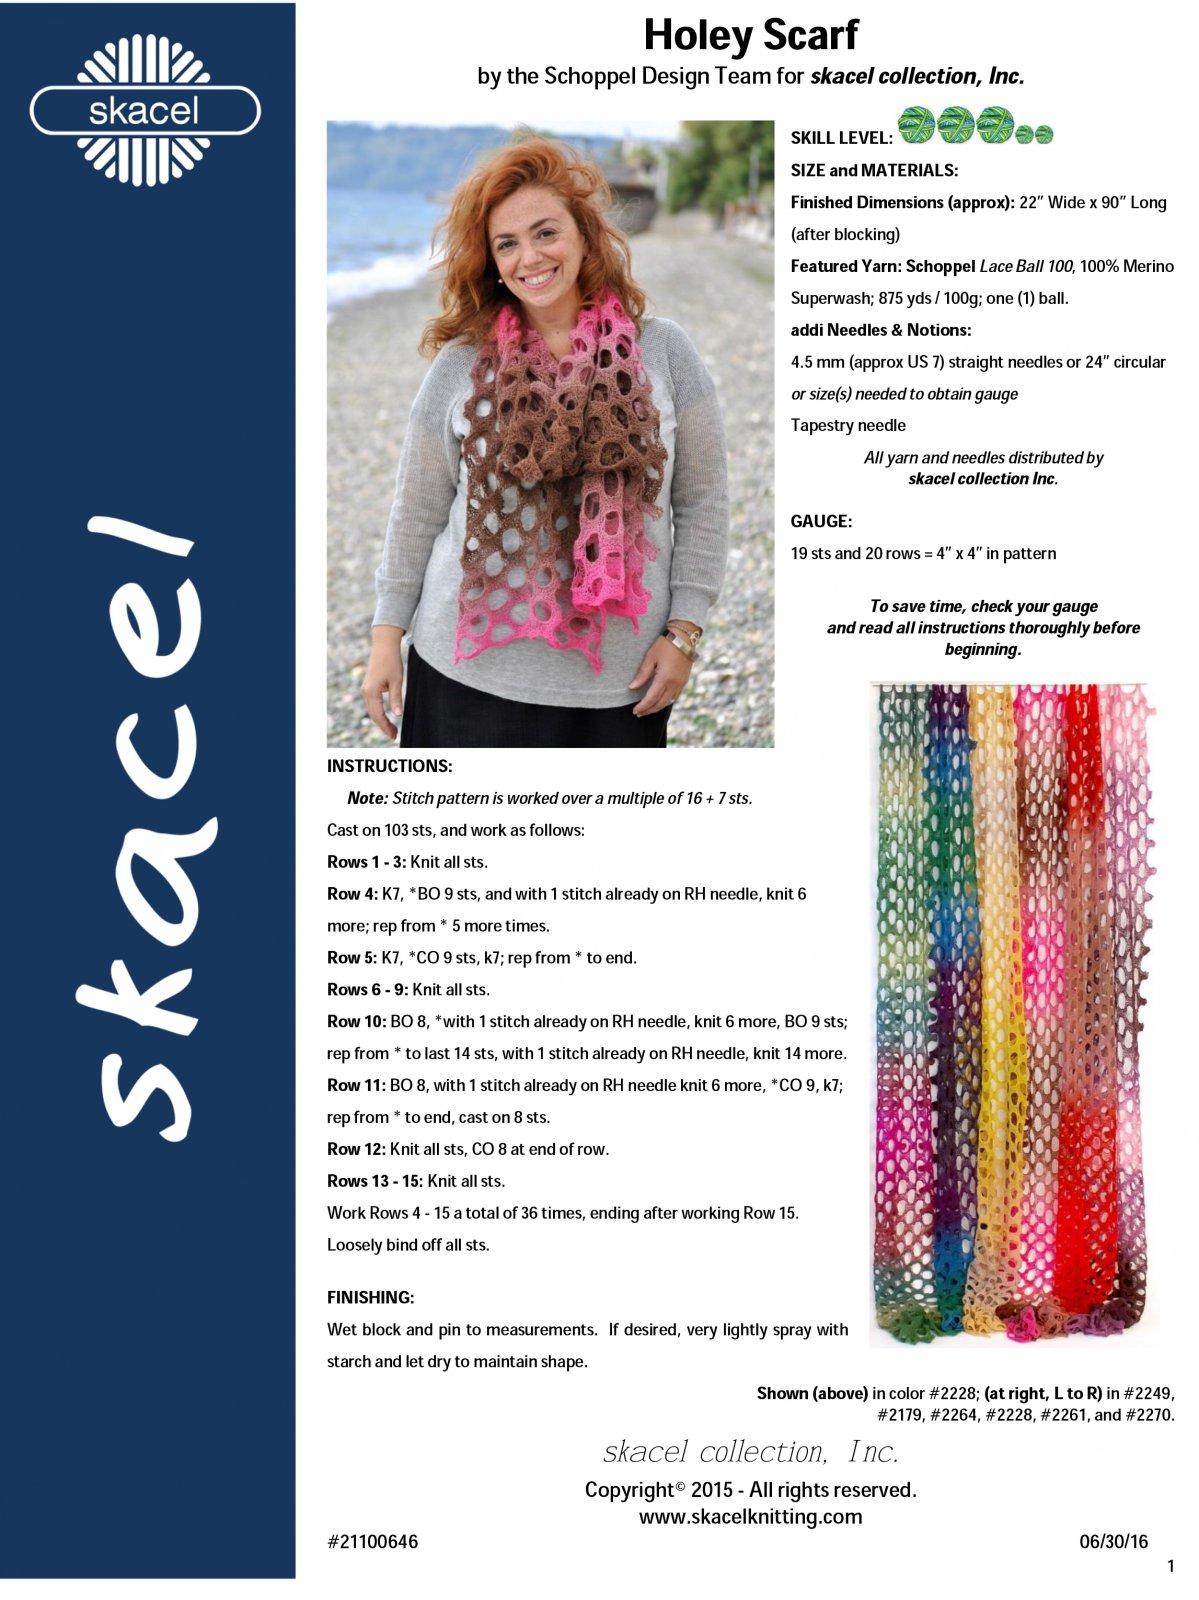 Holey Scarf knit pattern digital download